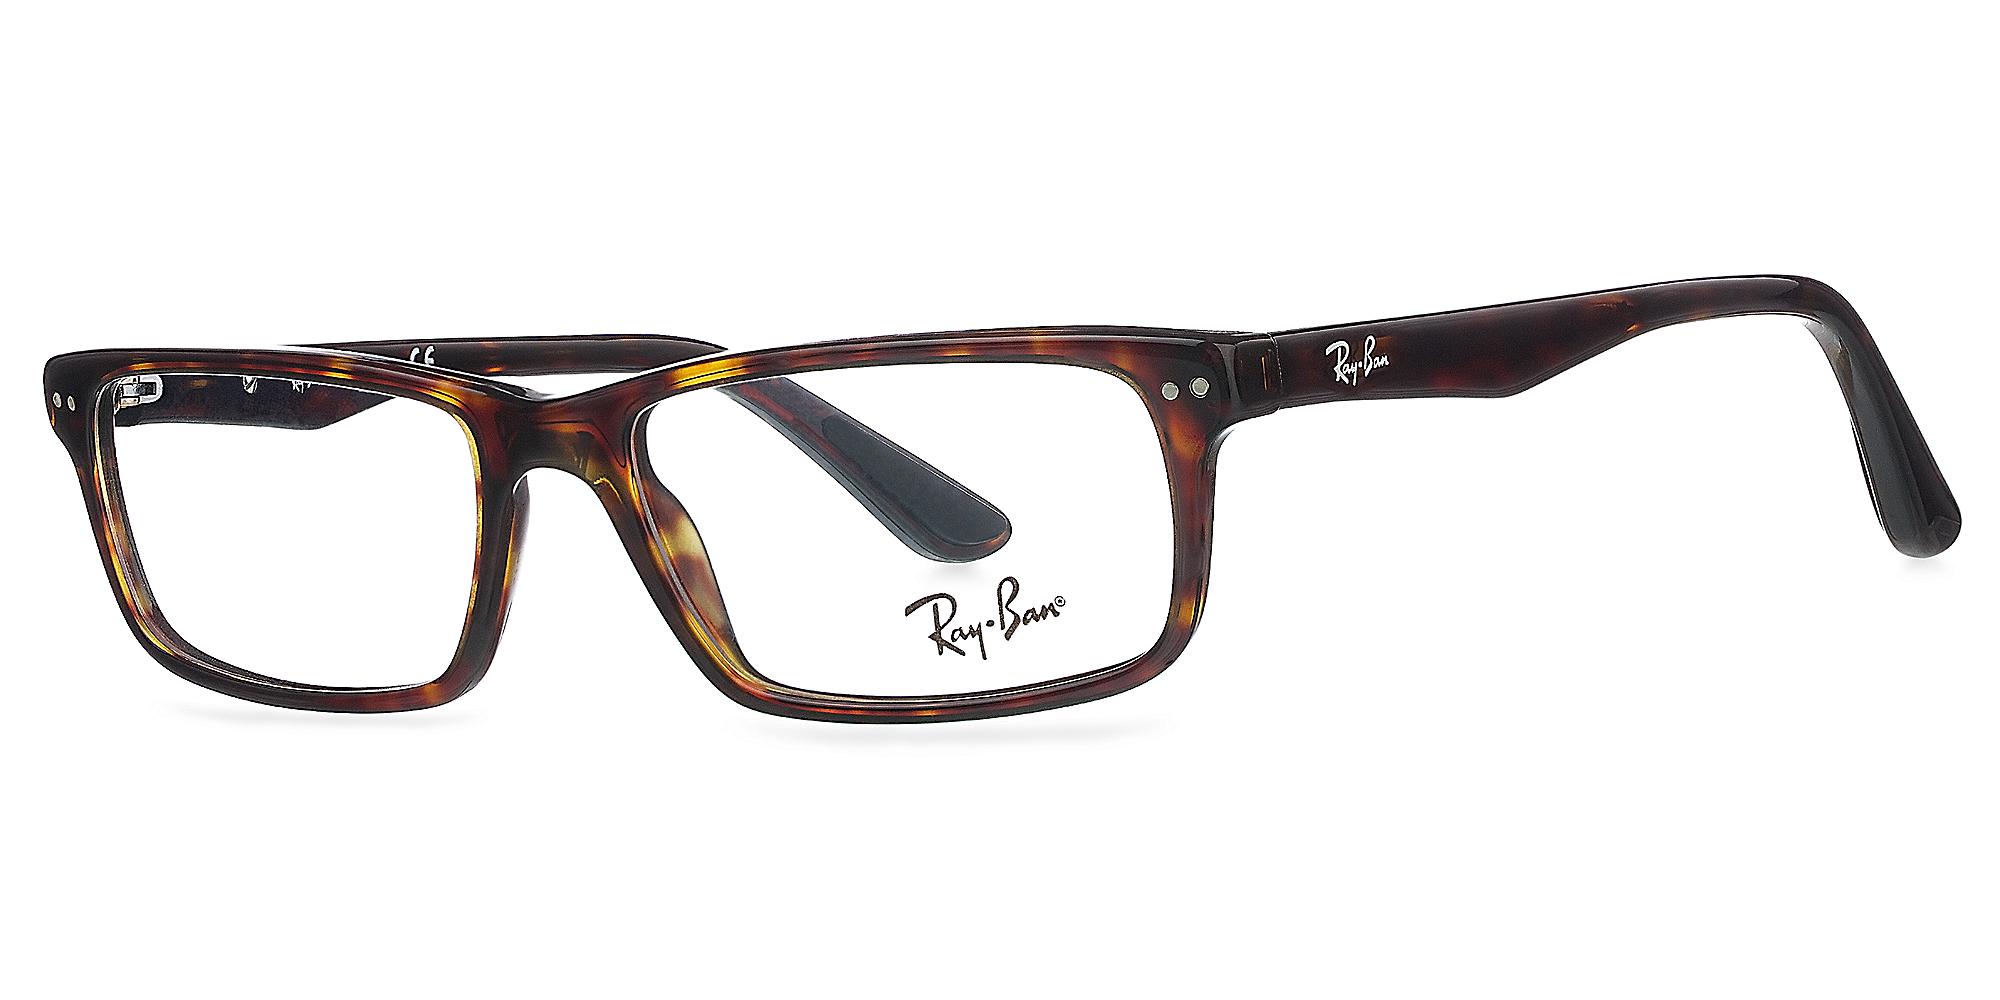 rayban eyewear iezp  RAY-BAN RX5277 FRAMES